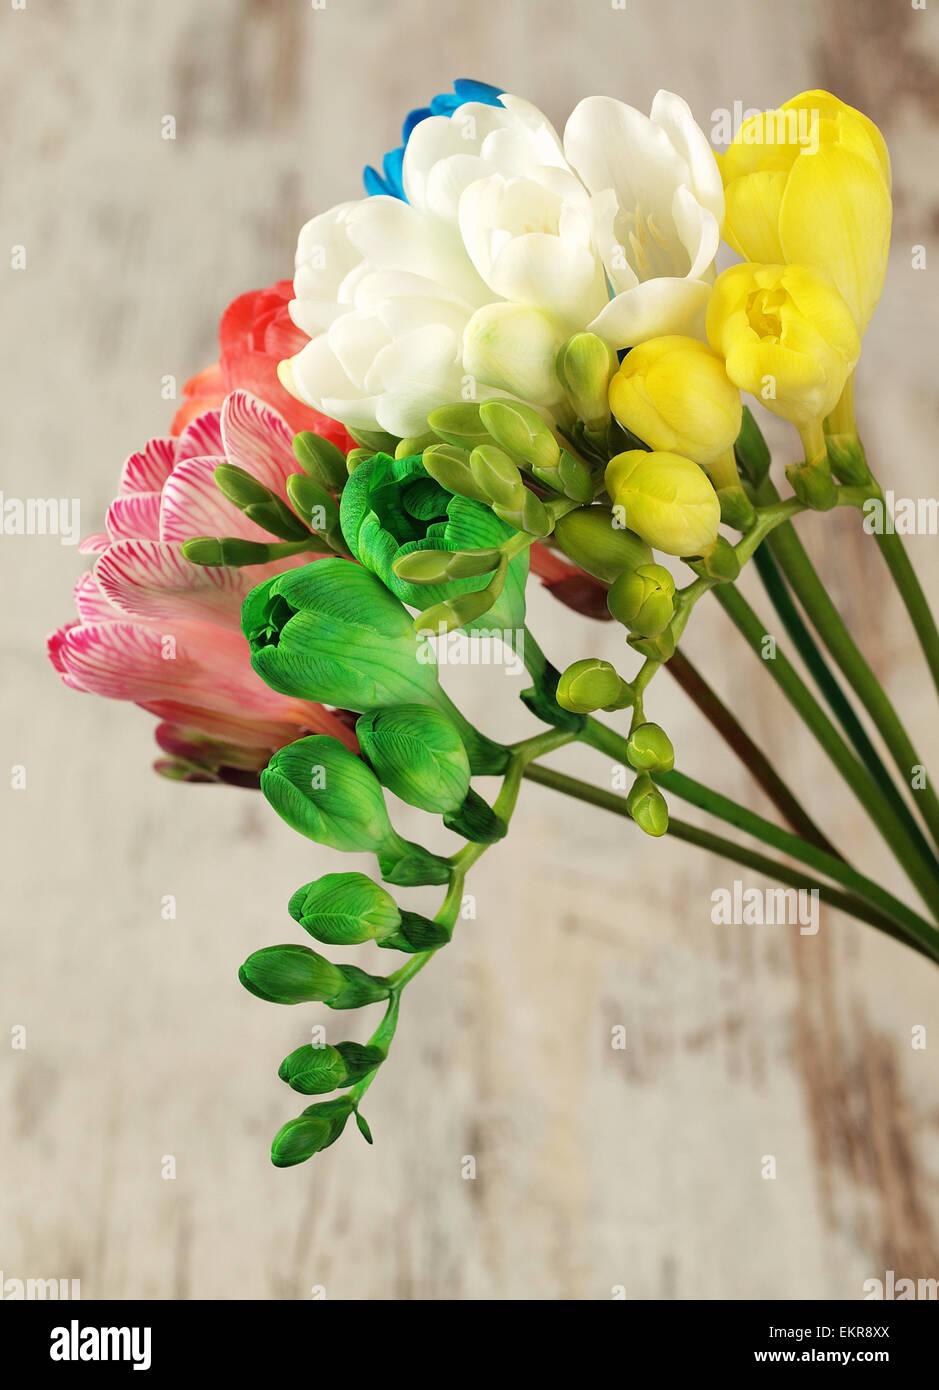 Beautiful bouquet freesia flowers stock photo 81031858 alamy beautiful bouquet freesia flowers izmirmasajfo